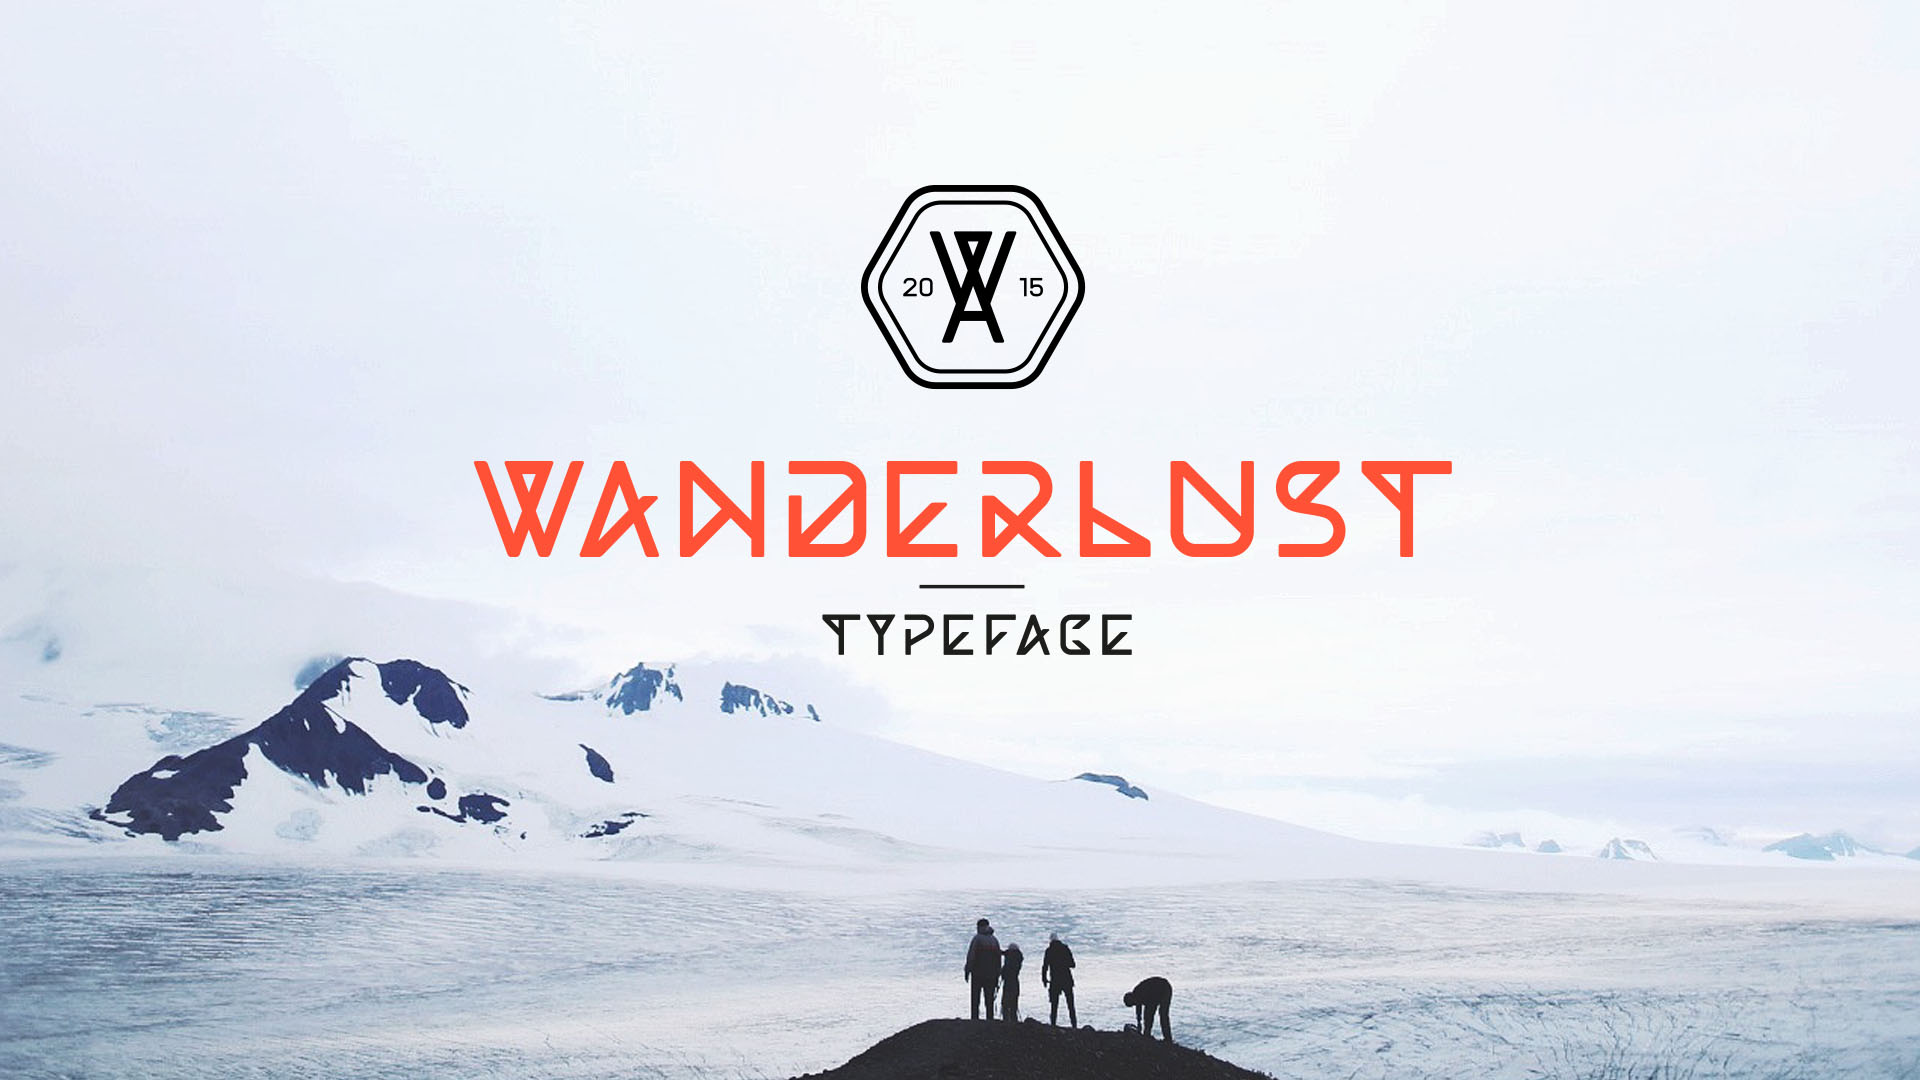 Wanderlust – Typeface